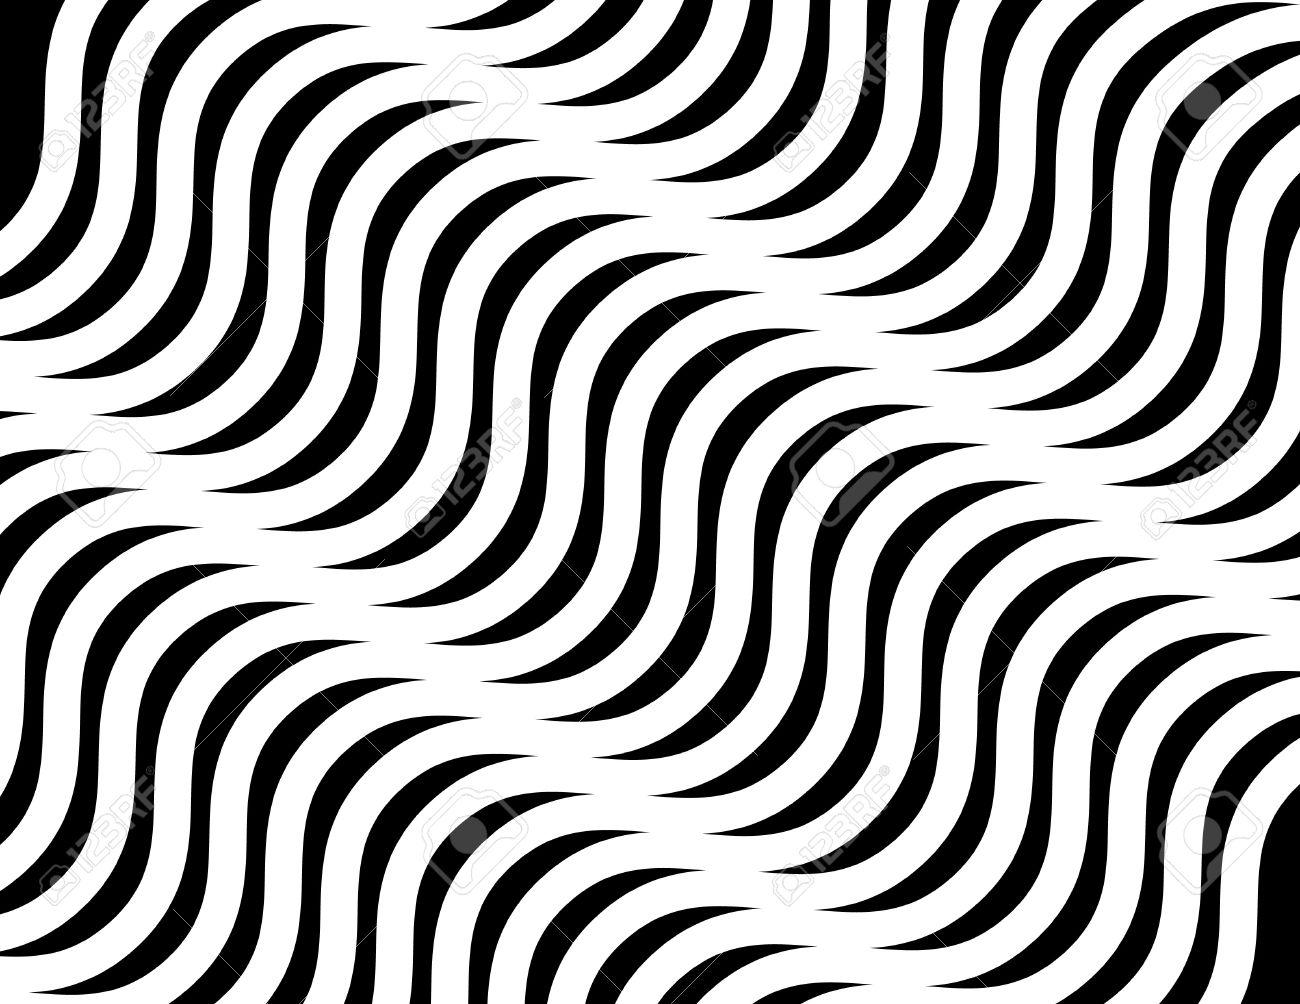 Vibration Waves Stock Vector - 6478790